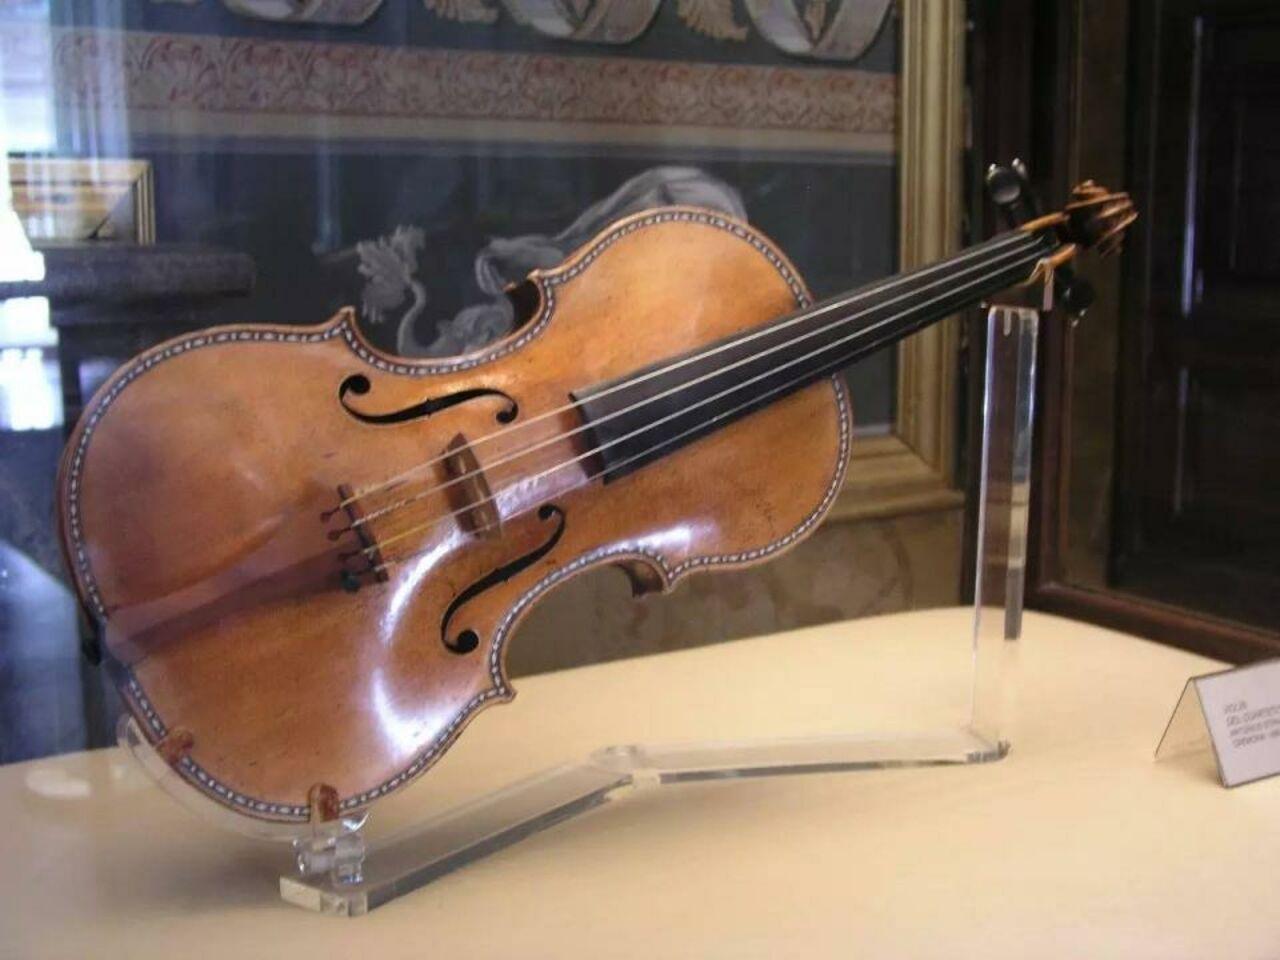 Москвич подменил скрипку супруги за50 млн руб. перед разводом